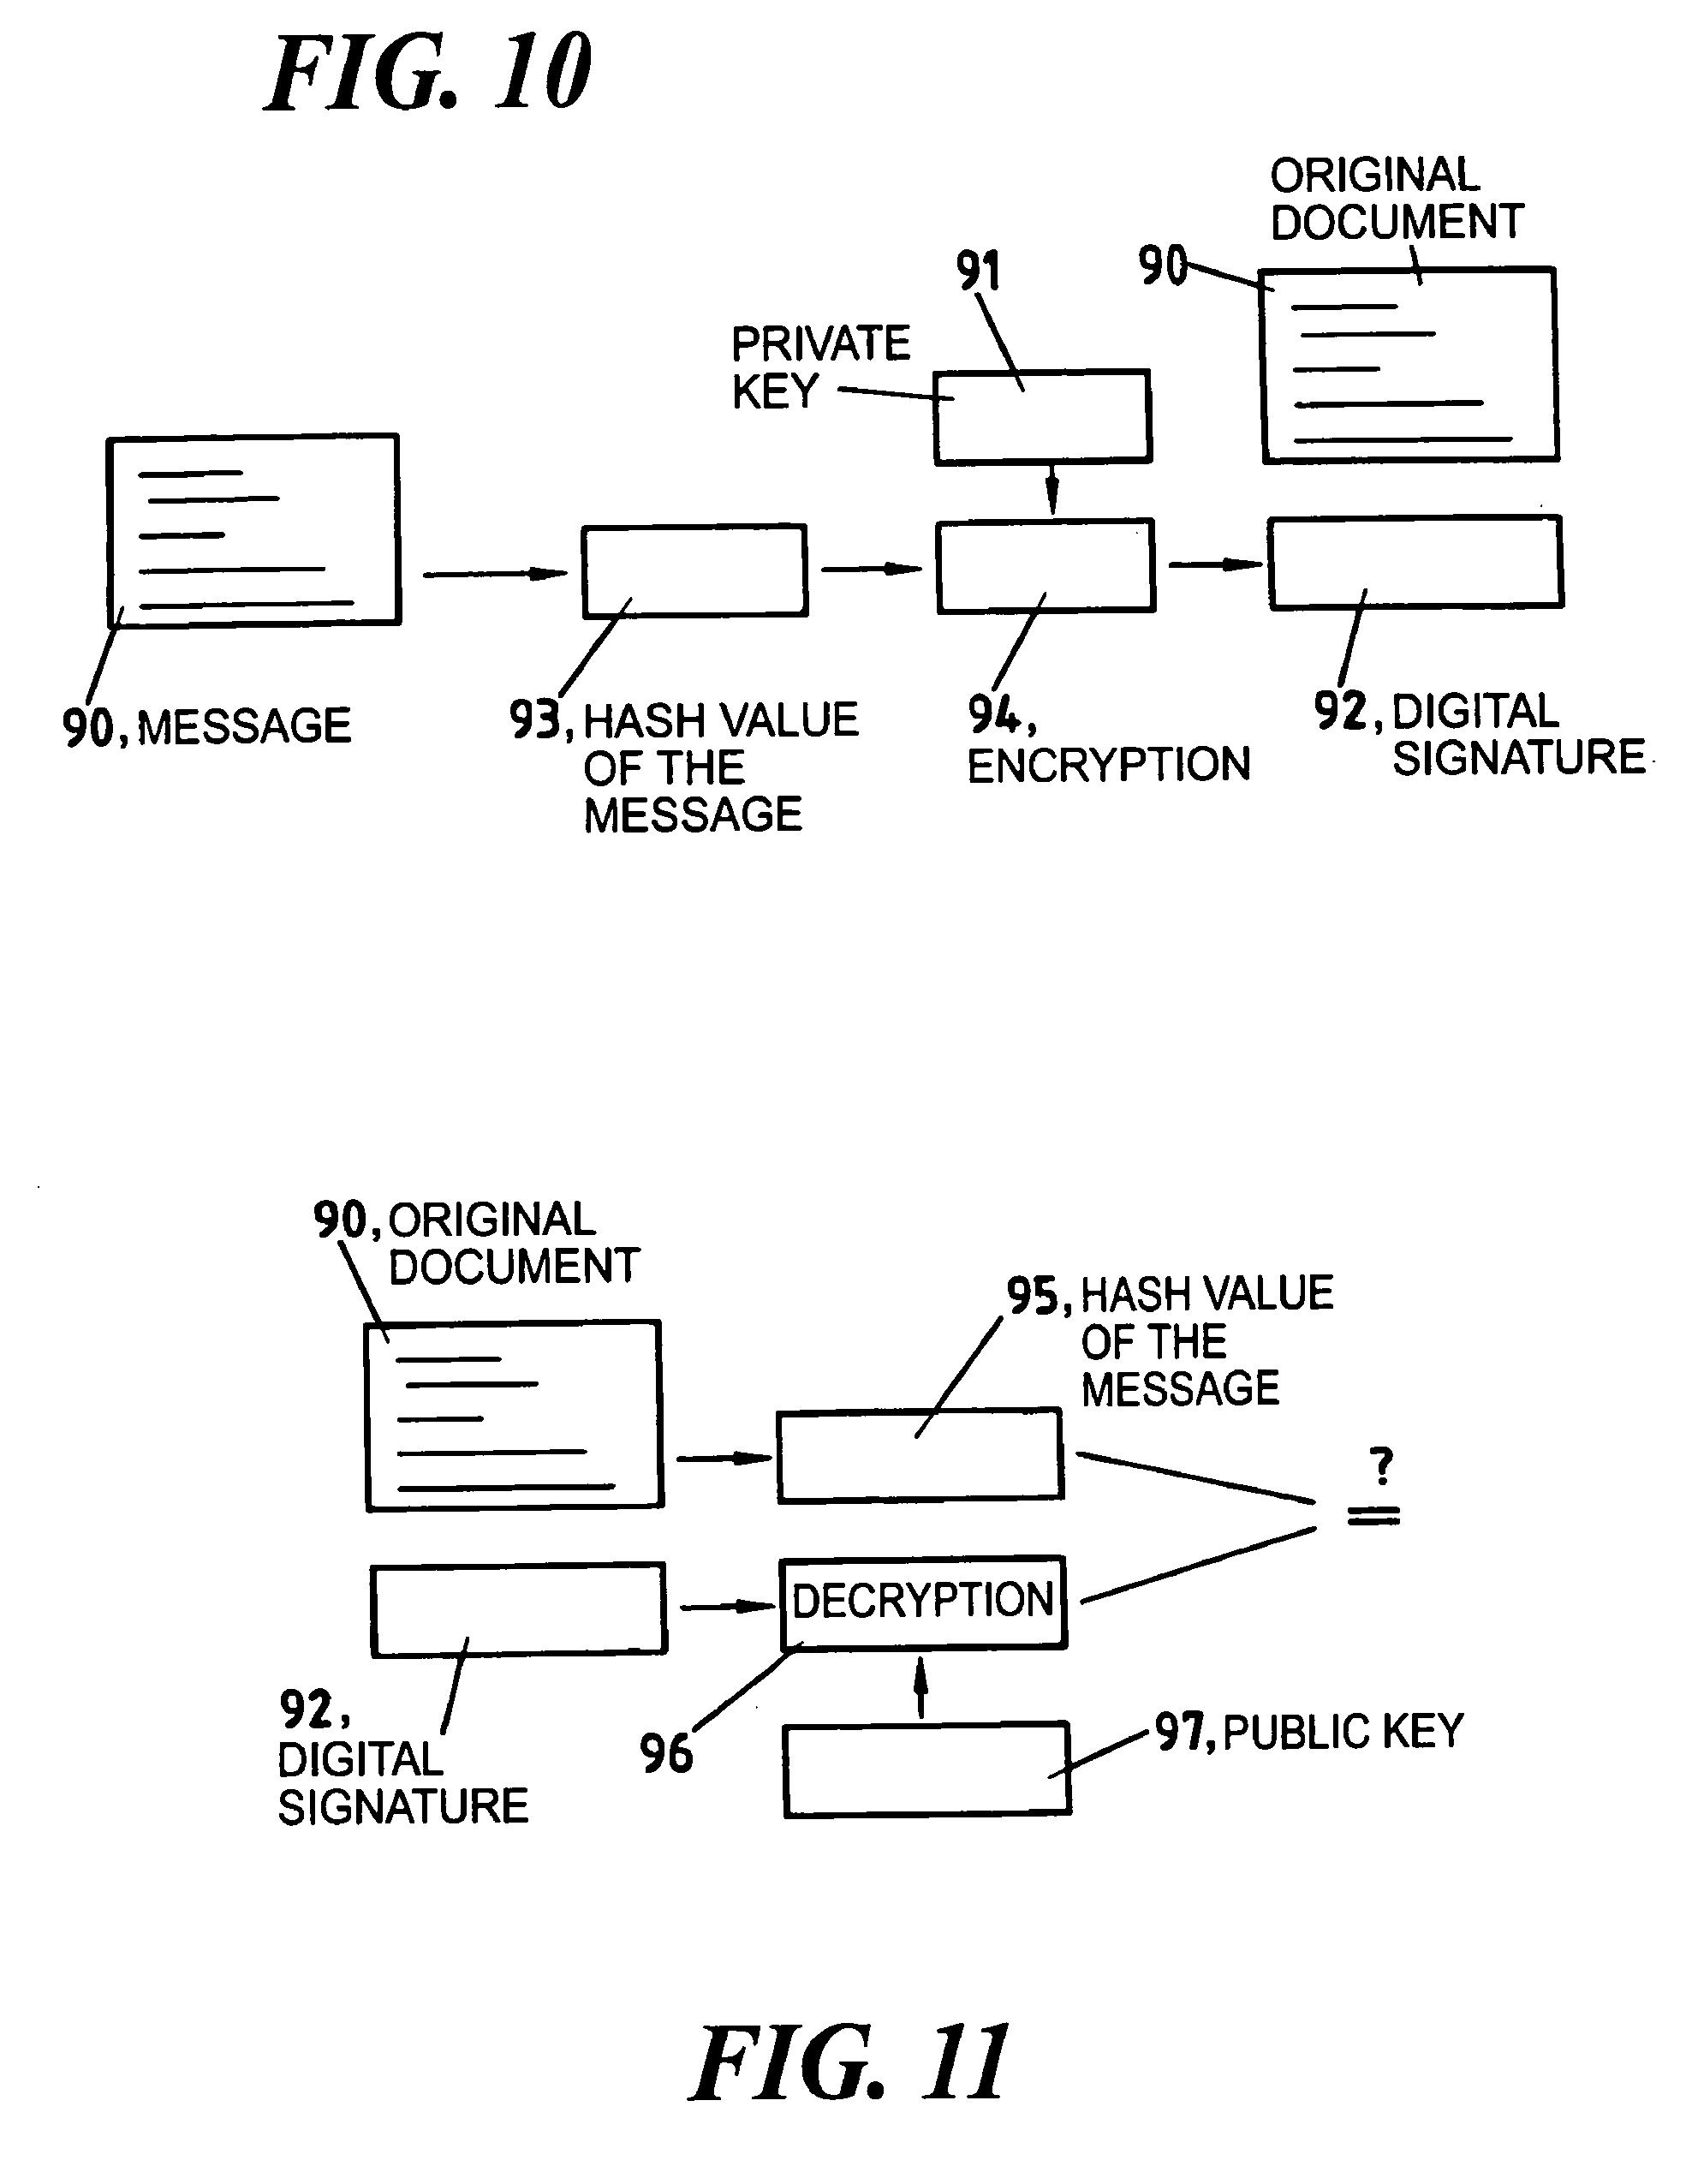 berridge company document flowchart